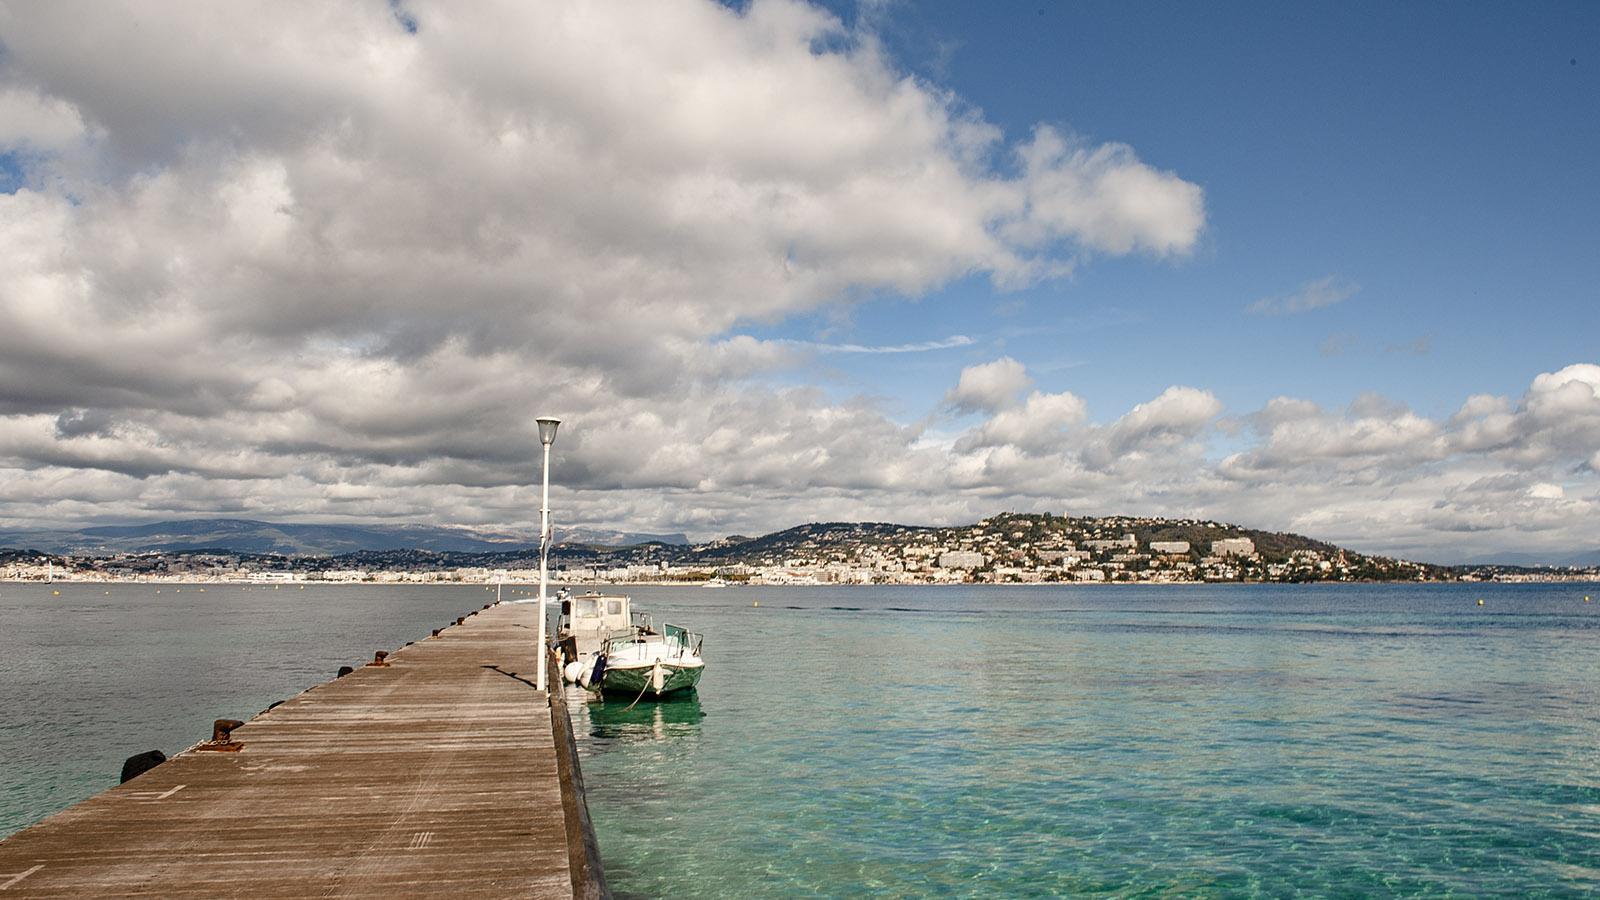 Blick vom Anleger der Île Sainte-Marguerite auf Cannes. Foto: Hilke Maunder